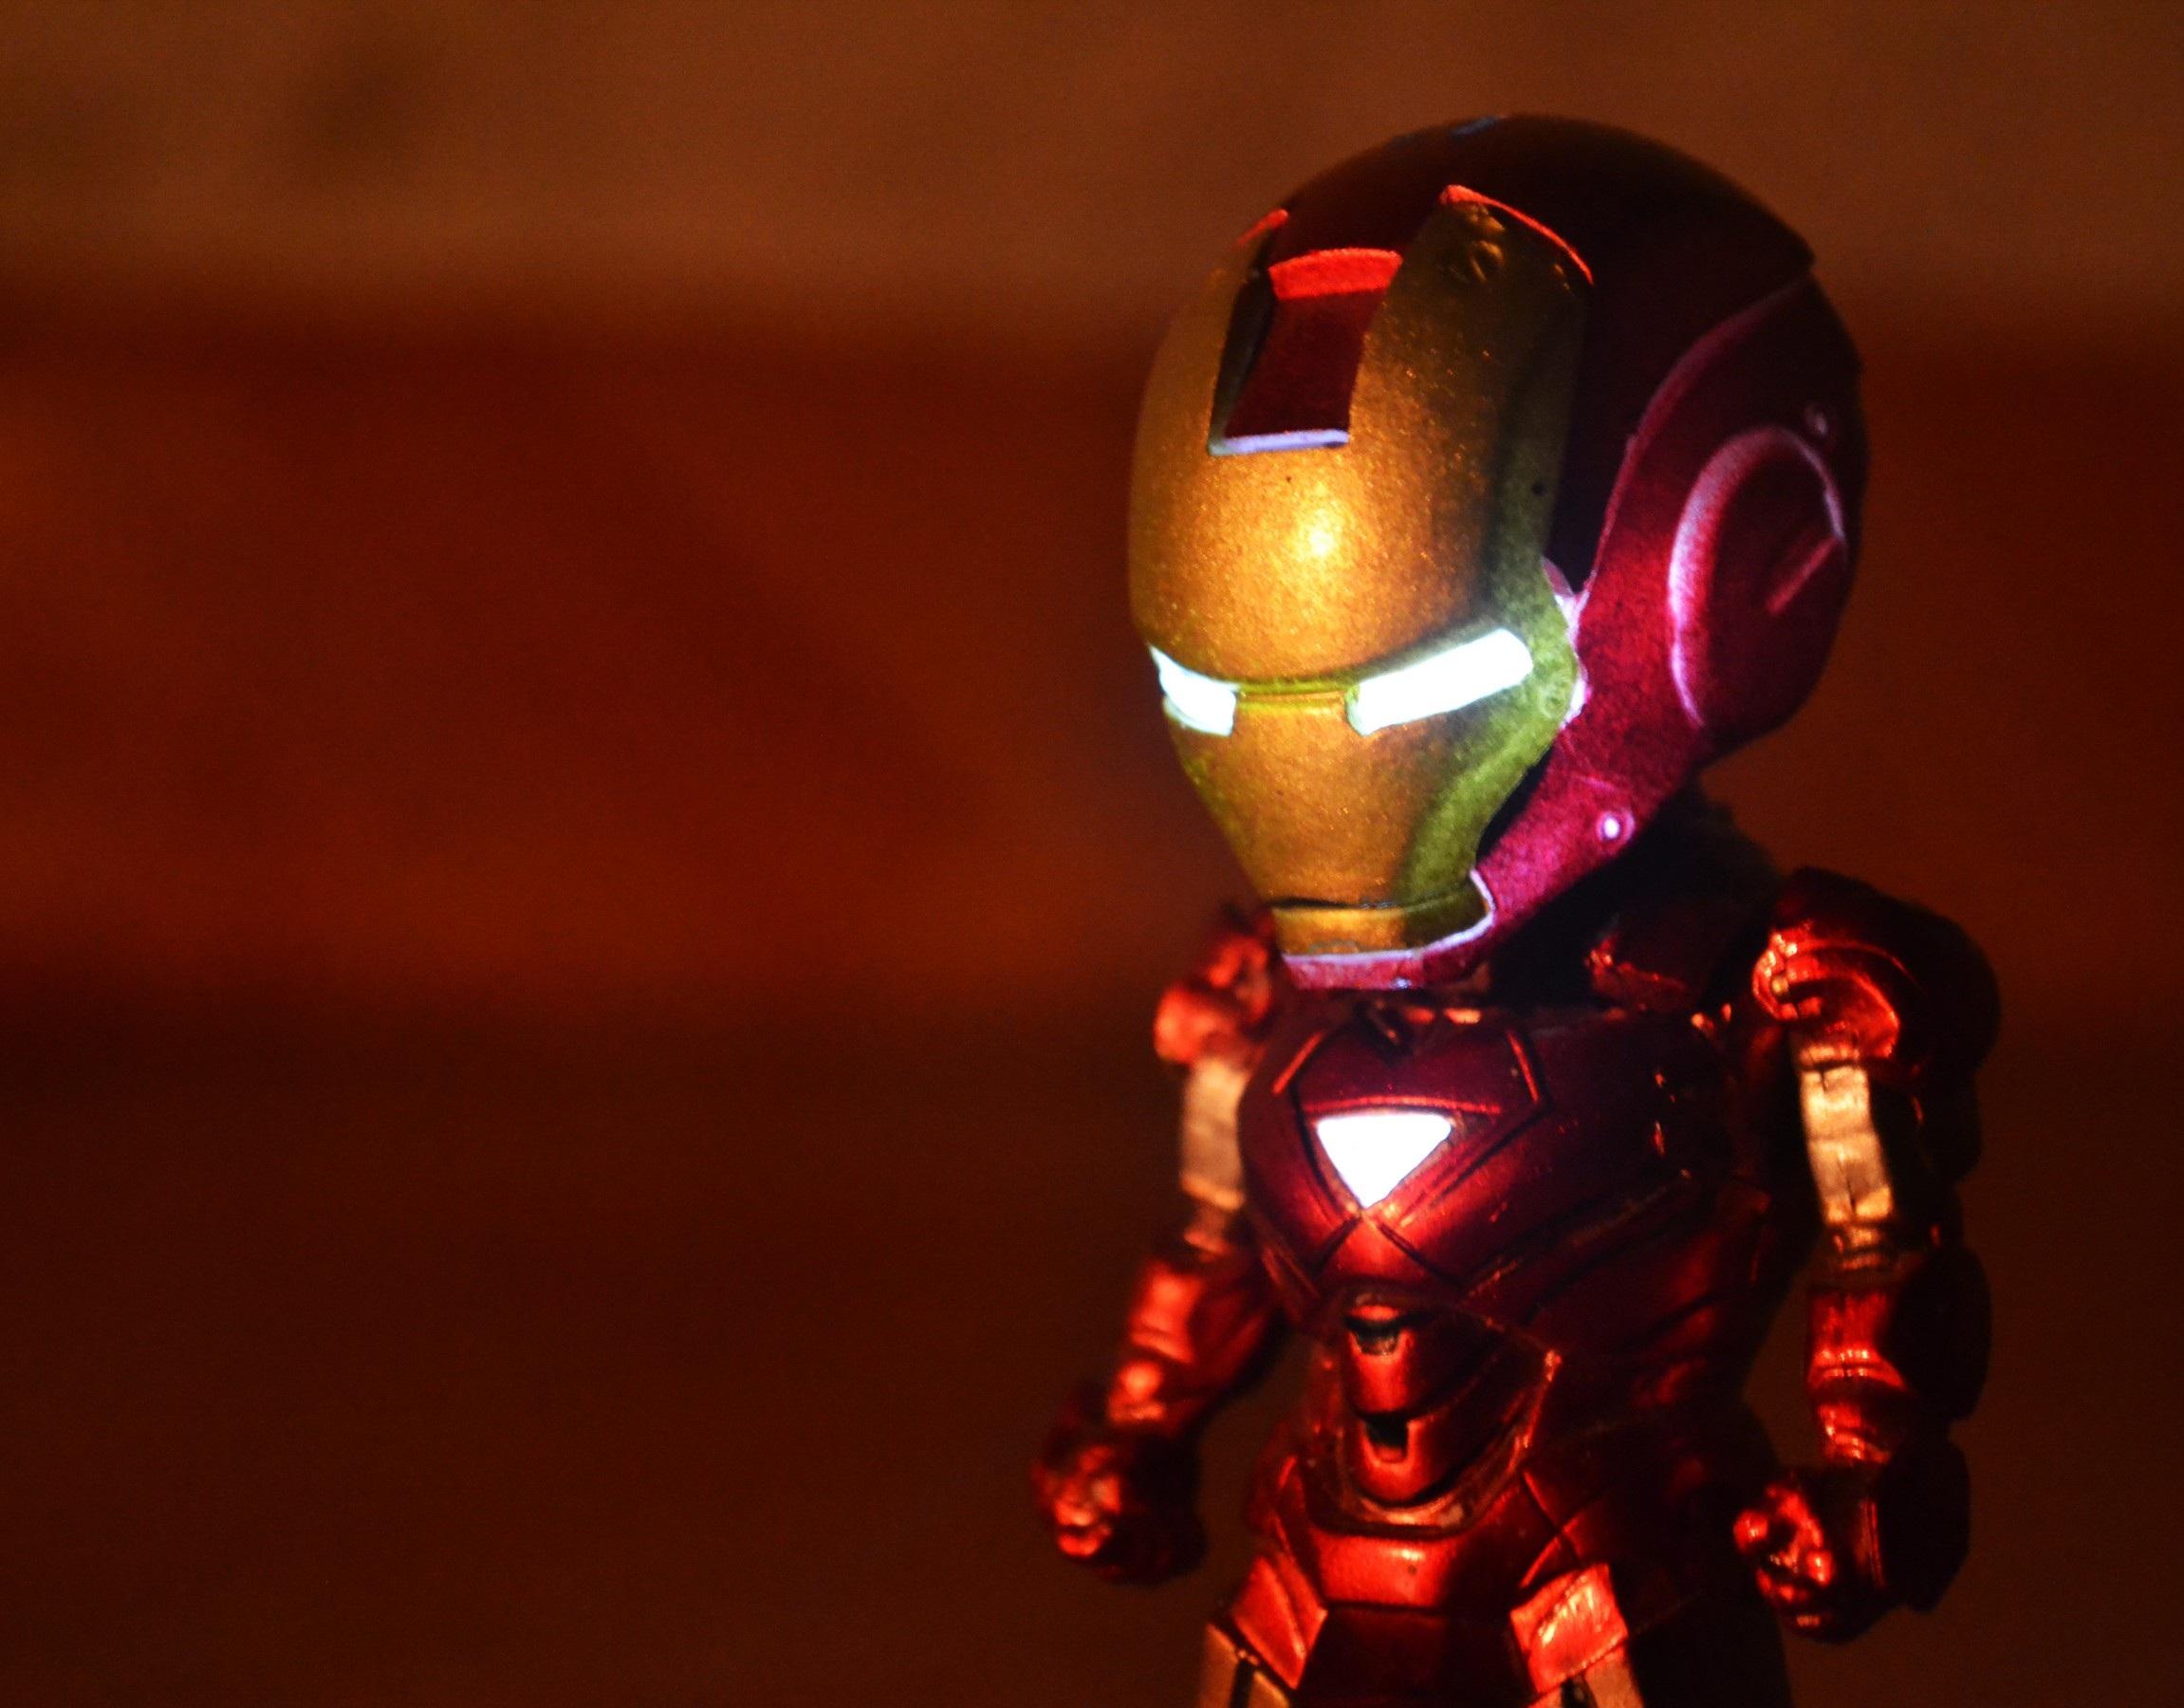 iron man, 超级英雄,钢铁侠o, 未来派, 电影 - 高清壁纸 - 教授-falken.com